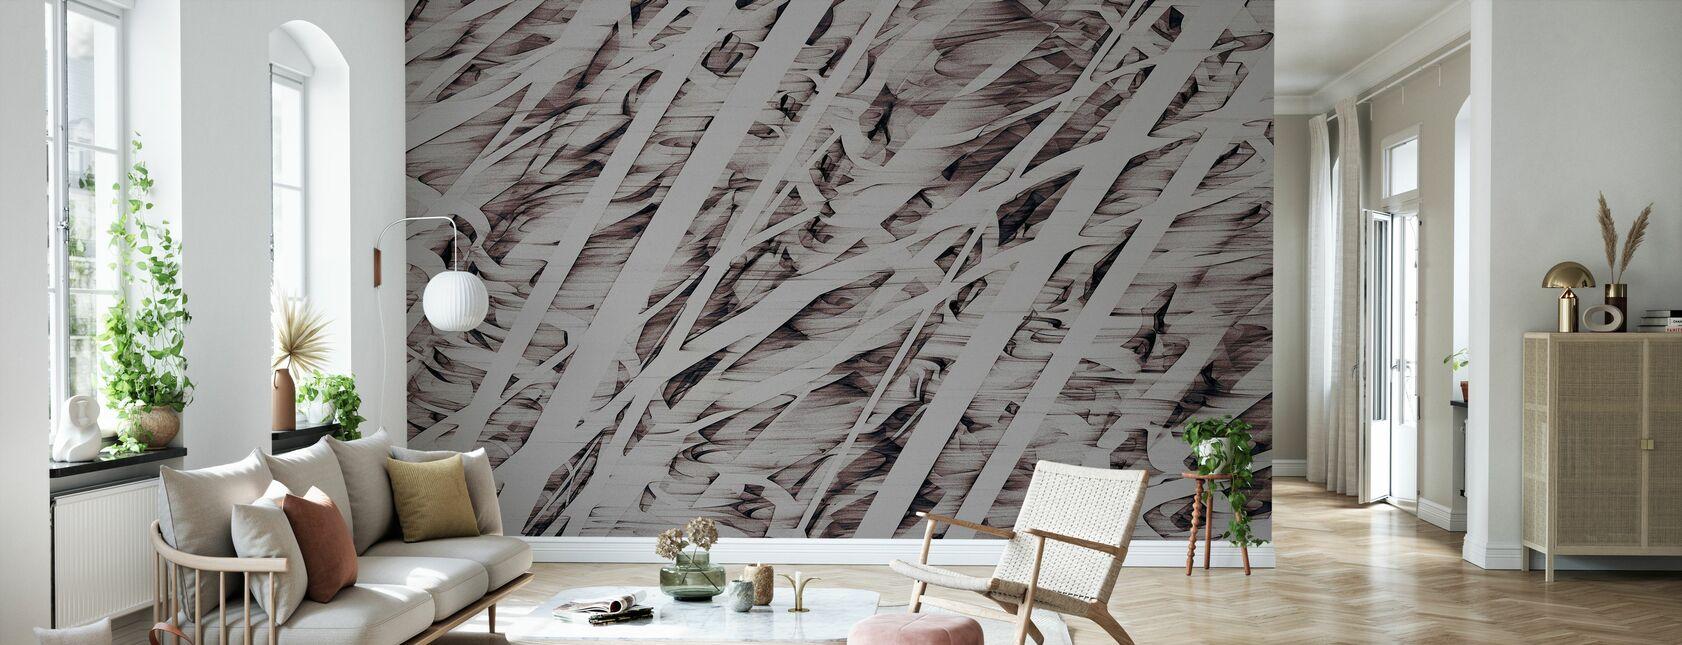 Dextro - K456WALL - Papier peint - Salle à manger